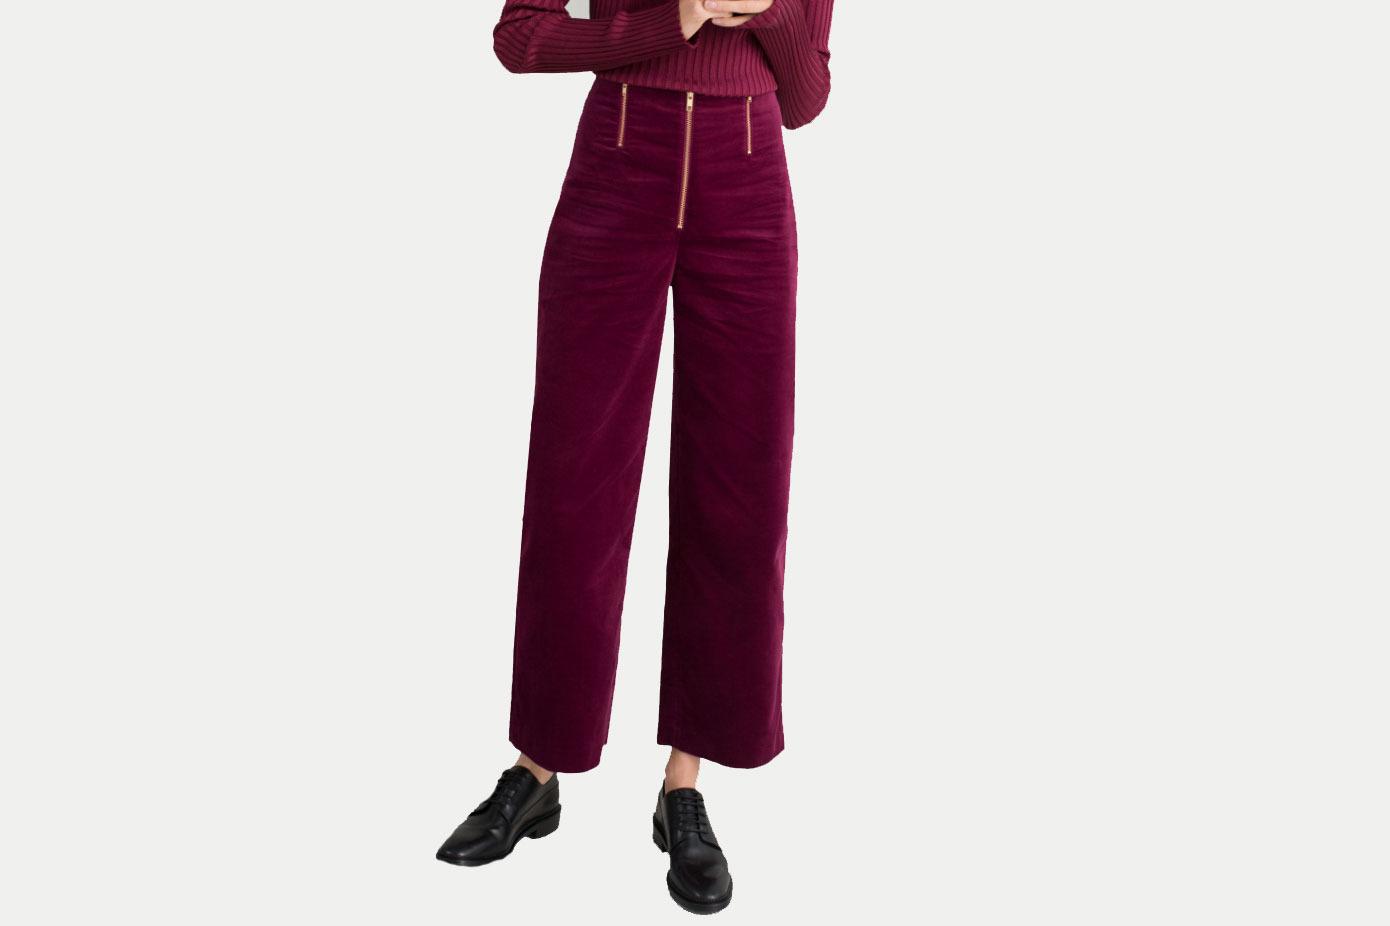 & Other Stories Trio Zipper Velvet Pants